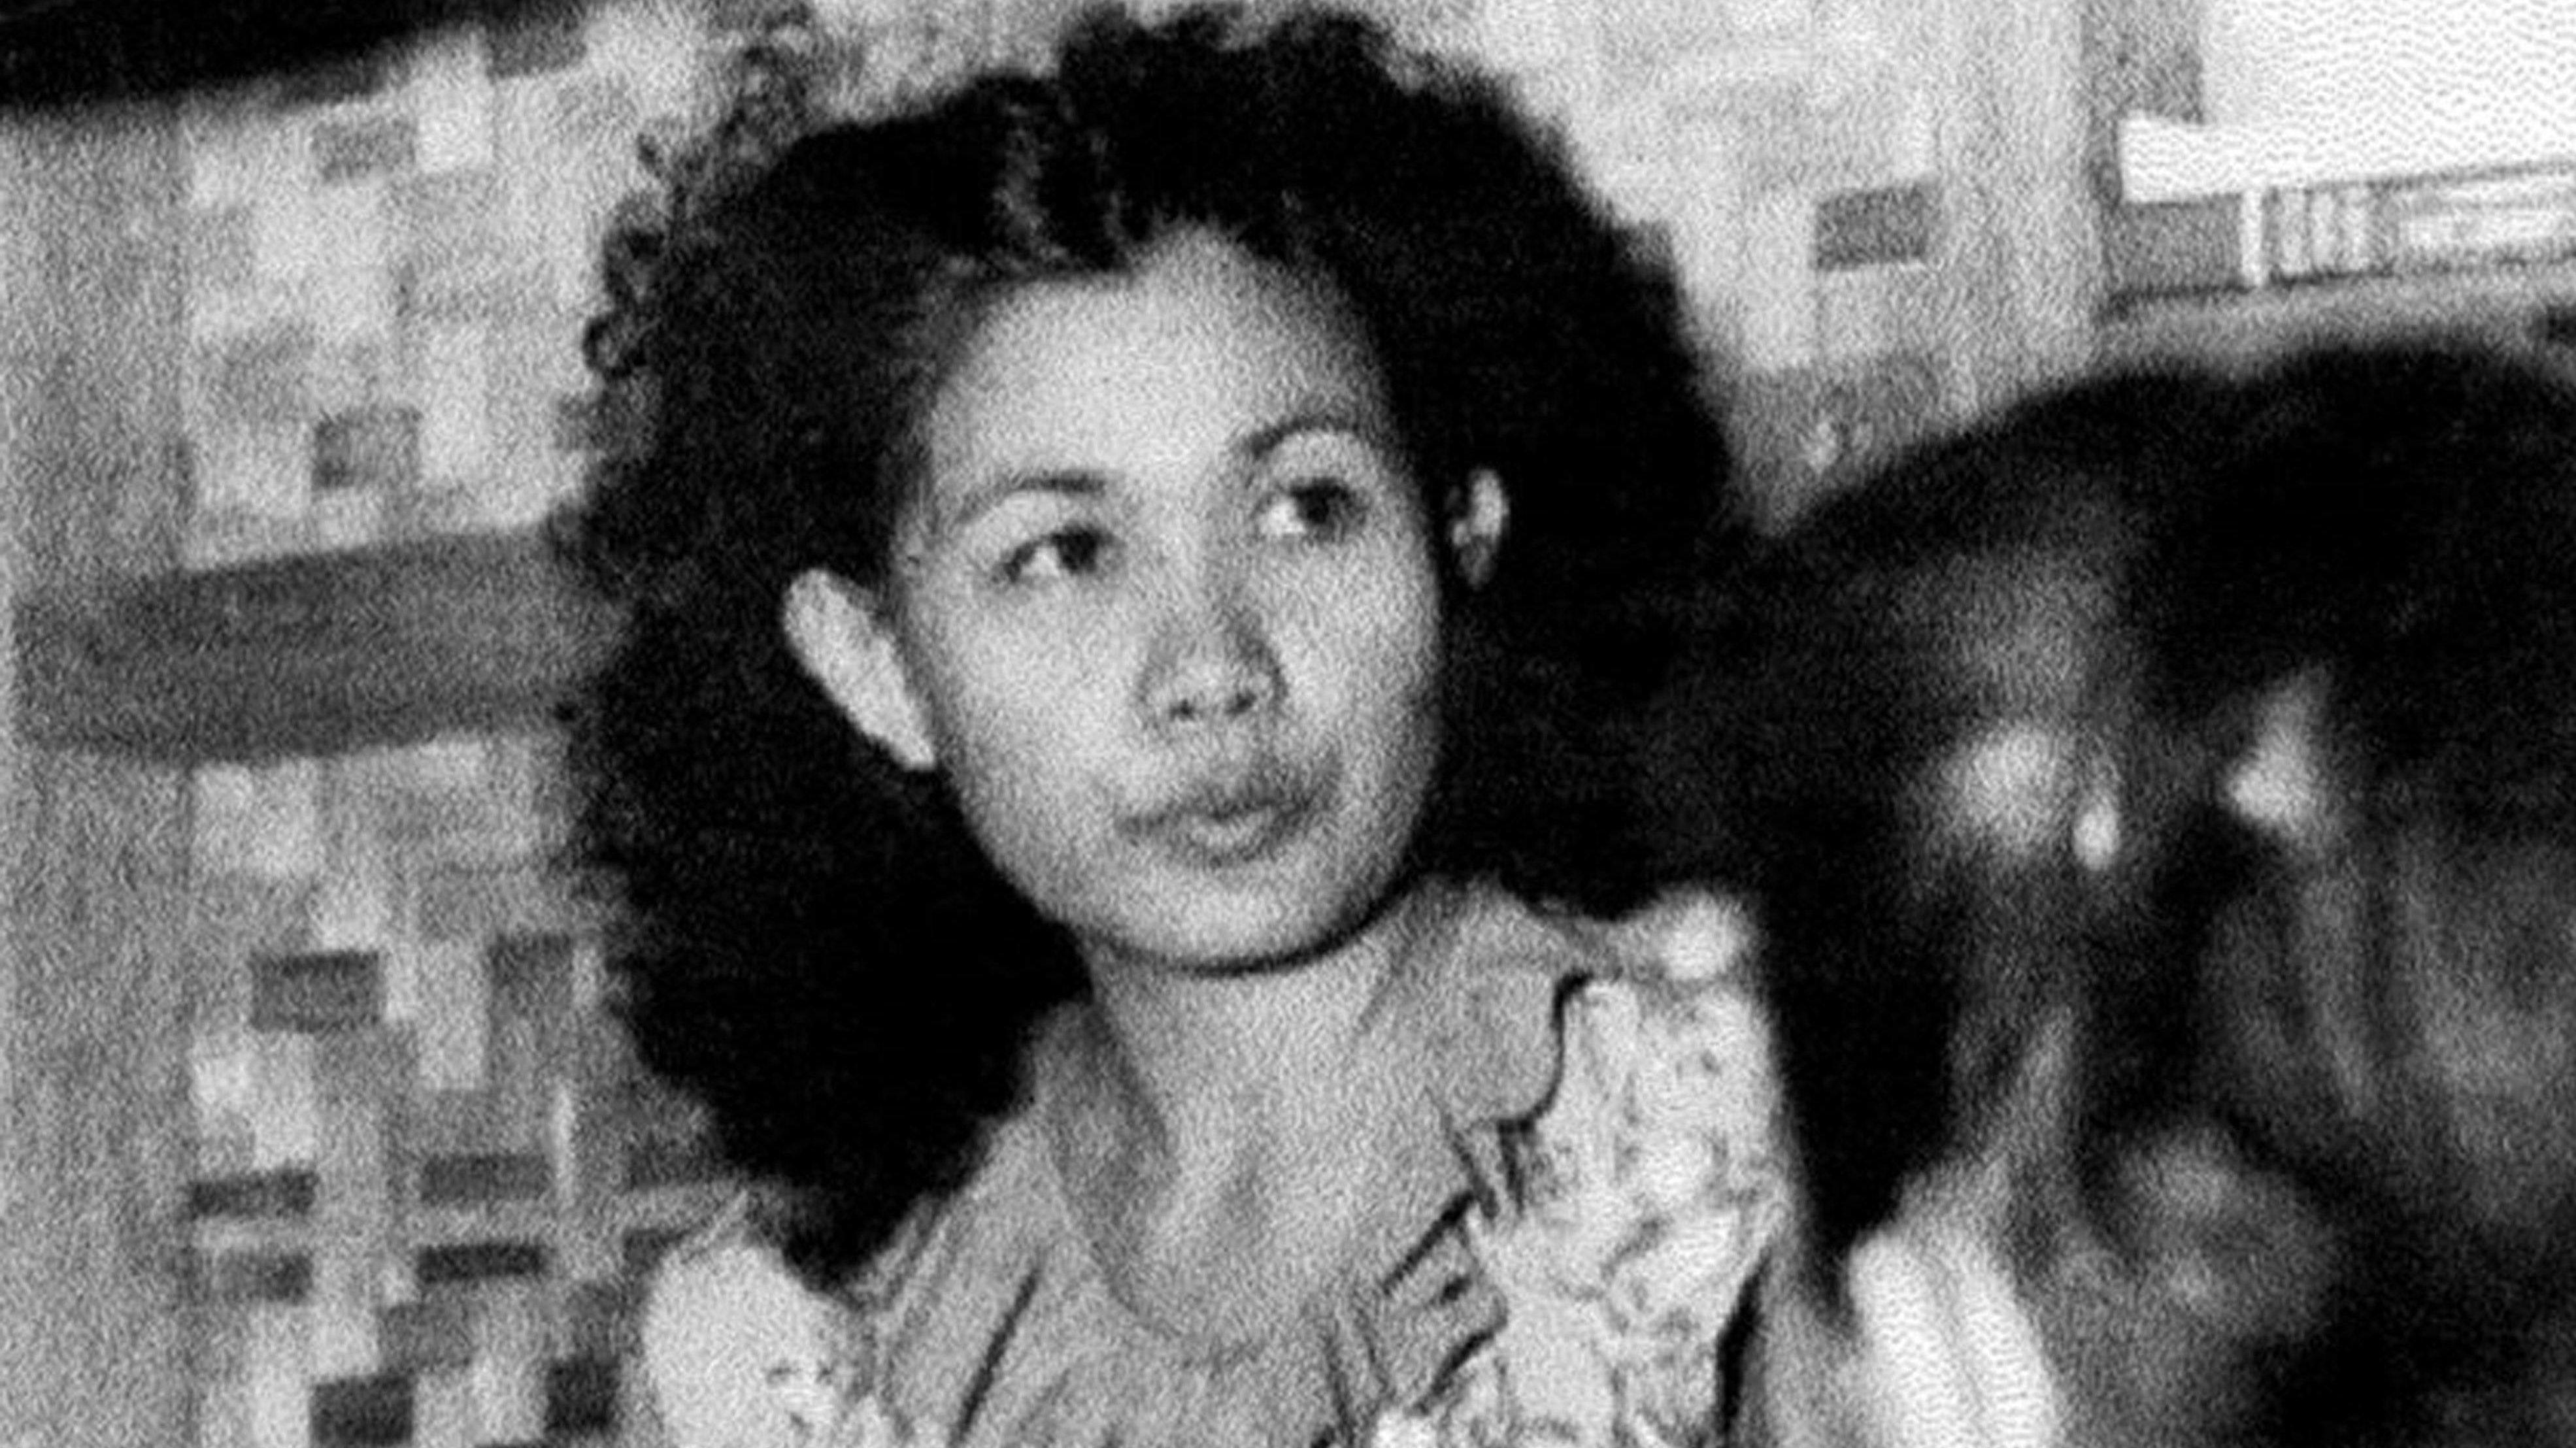 Remedios Gomez-Paraiso (1919-2014), auch bekannt unter dem Namen Kumander Liwayway